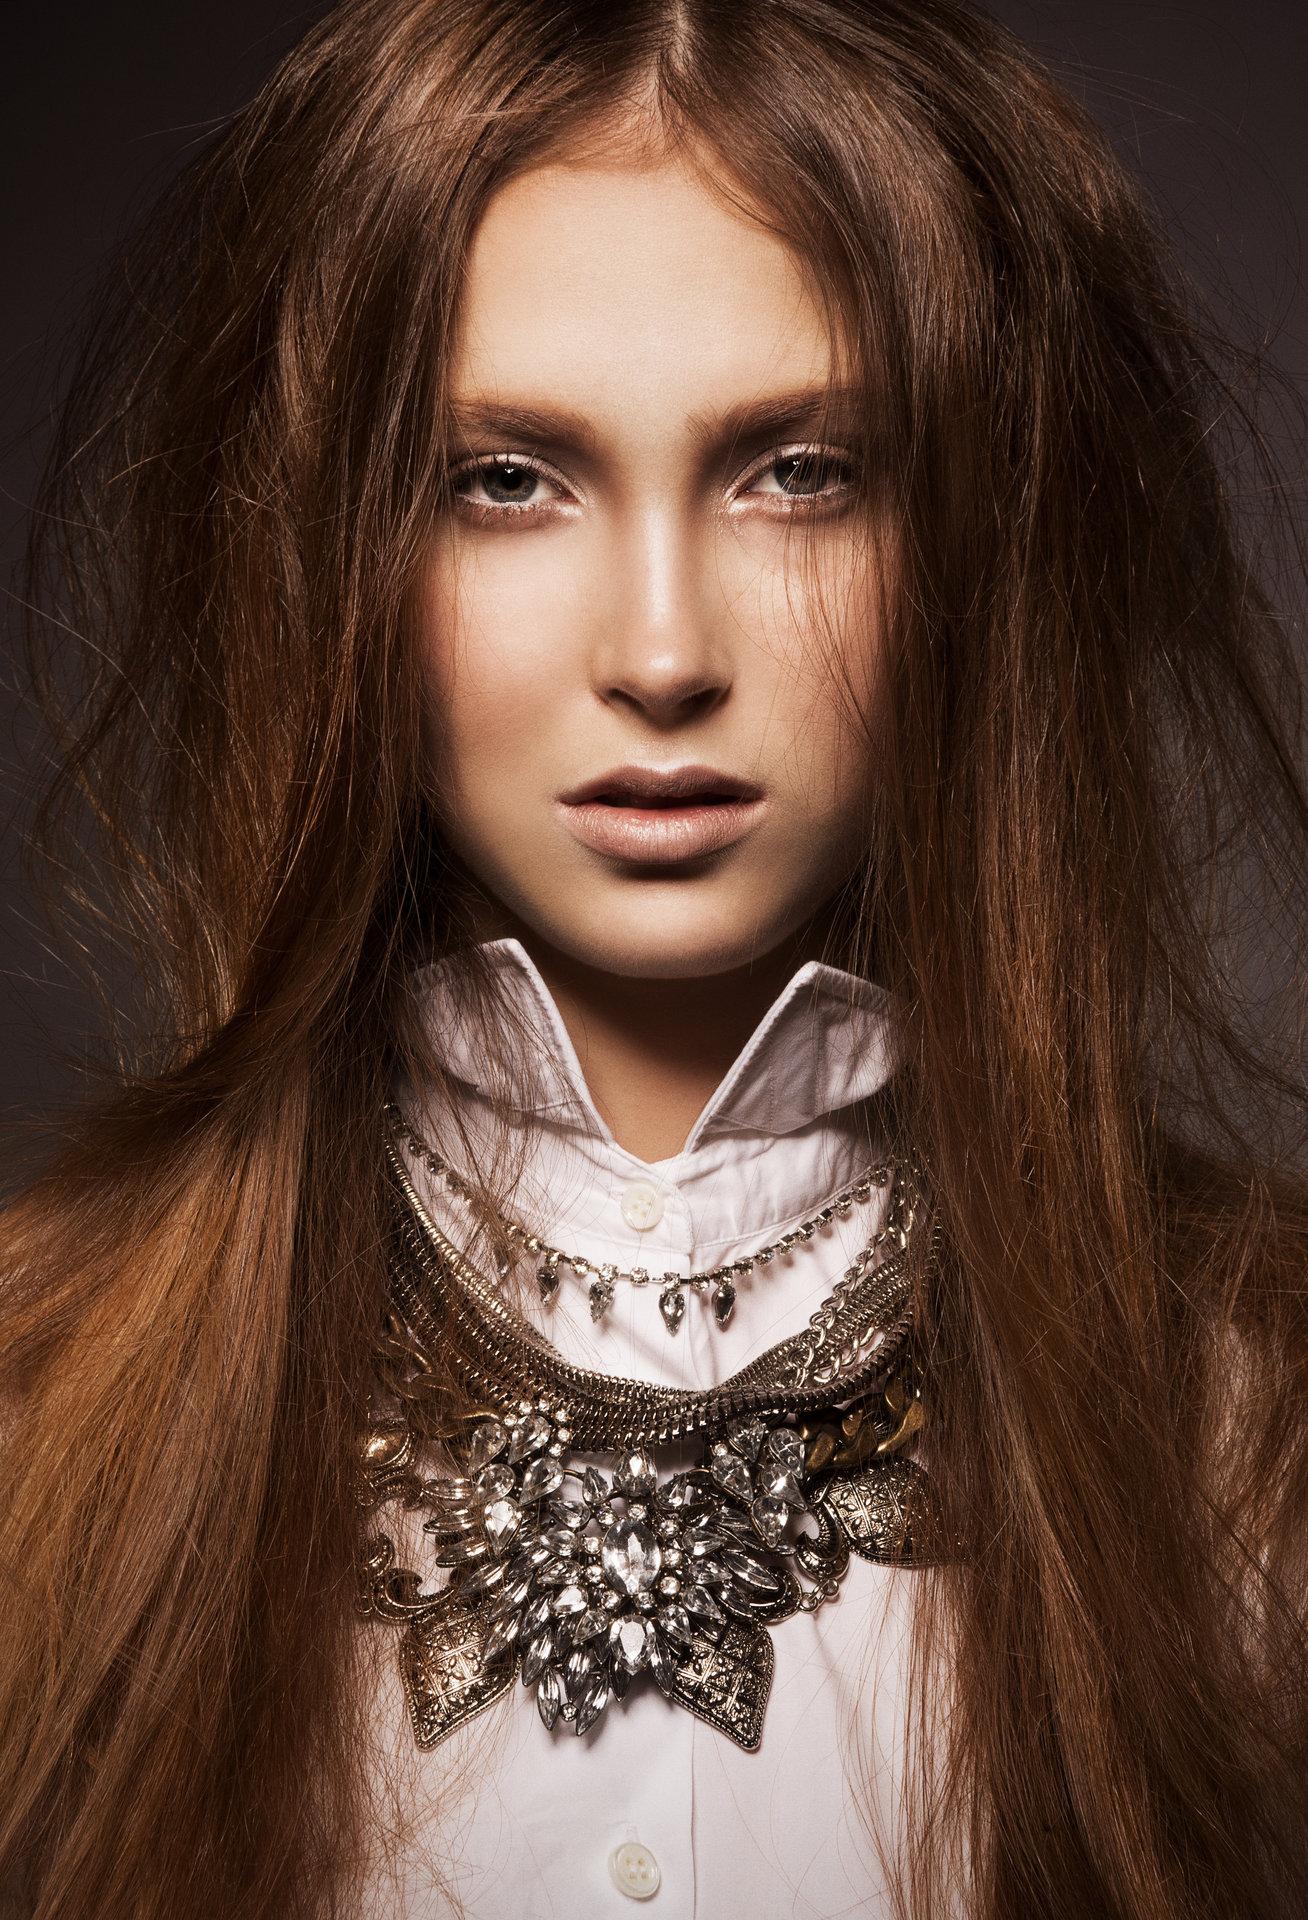 Hair & Make-up: Melanie Volkart Photographer: Ellin Anderegg Model: Claudine Ana Cohen-Landolt